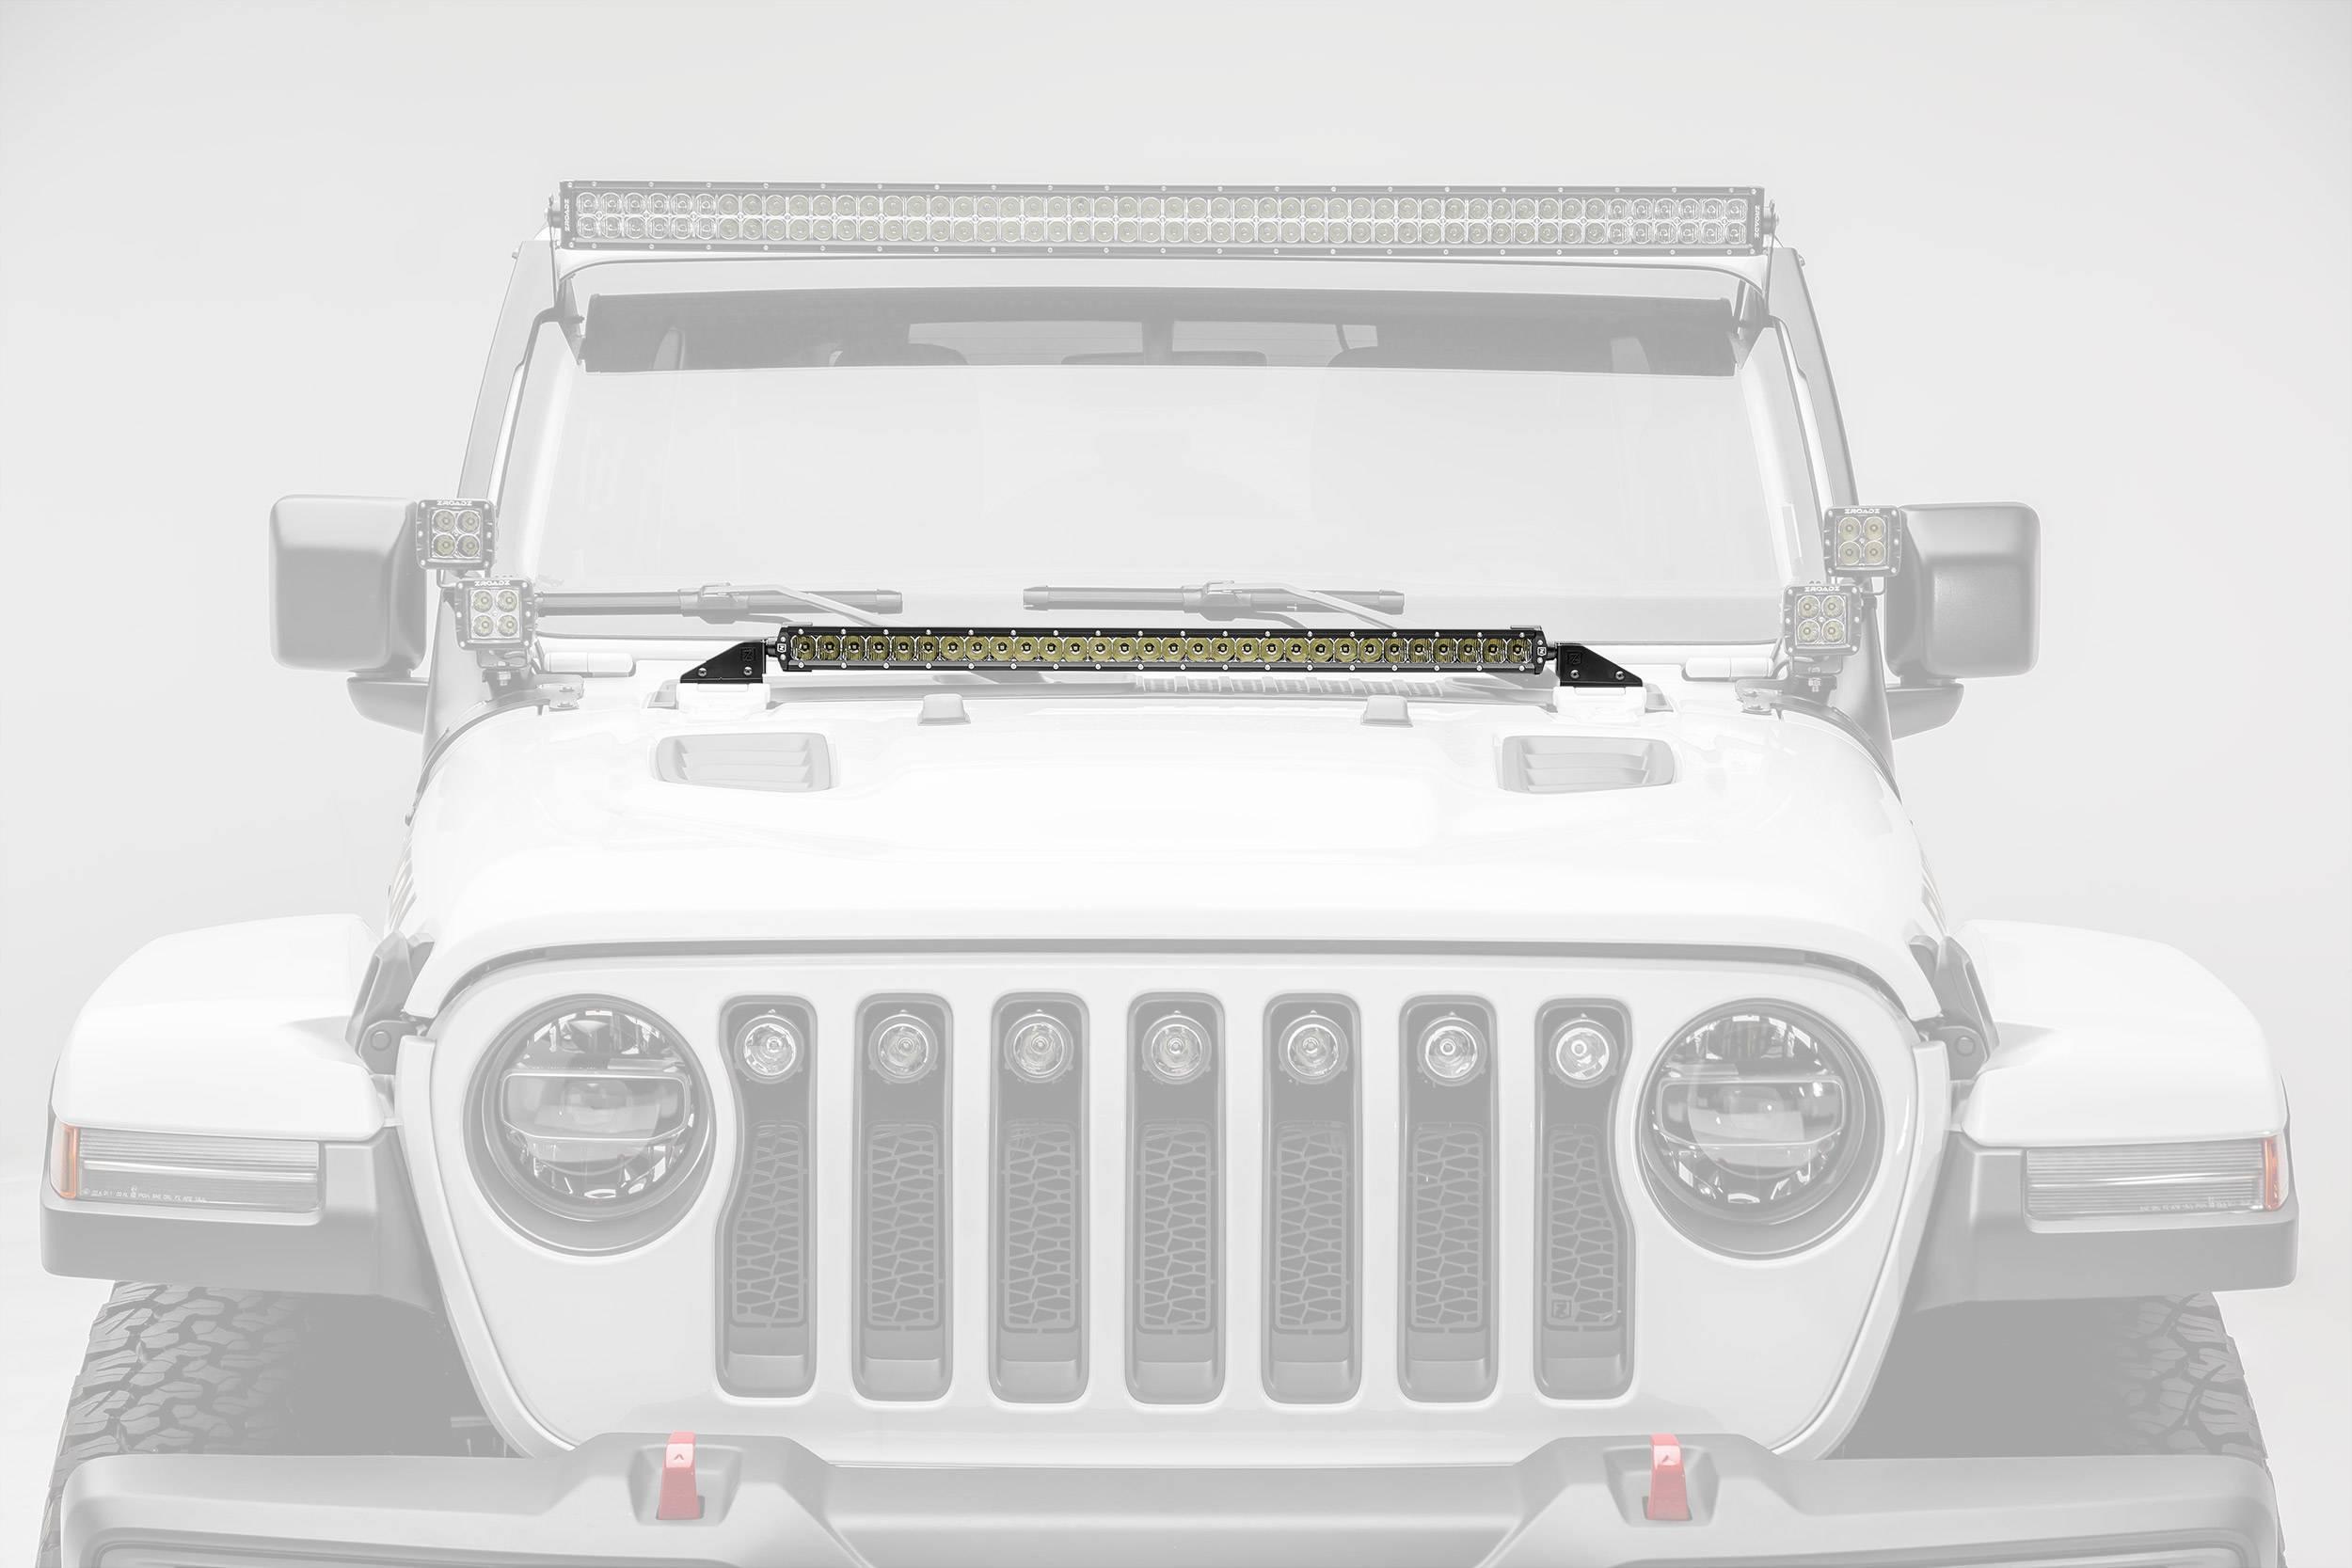 ZROADZ - Jeep JL, Gladiator Hood Cowl LED Kit with (1) 30 Inch LED Straight Single Row Slim Light Bar - PN #Z364931-KIT